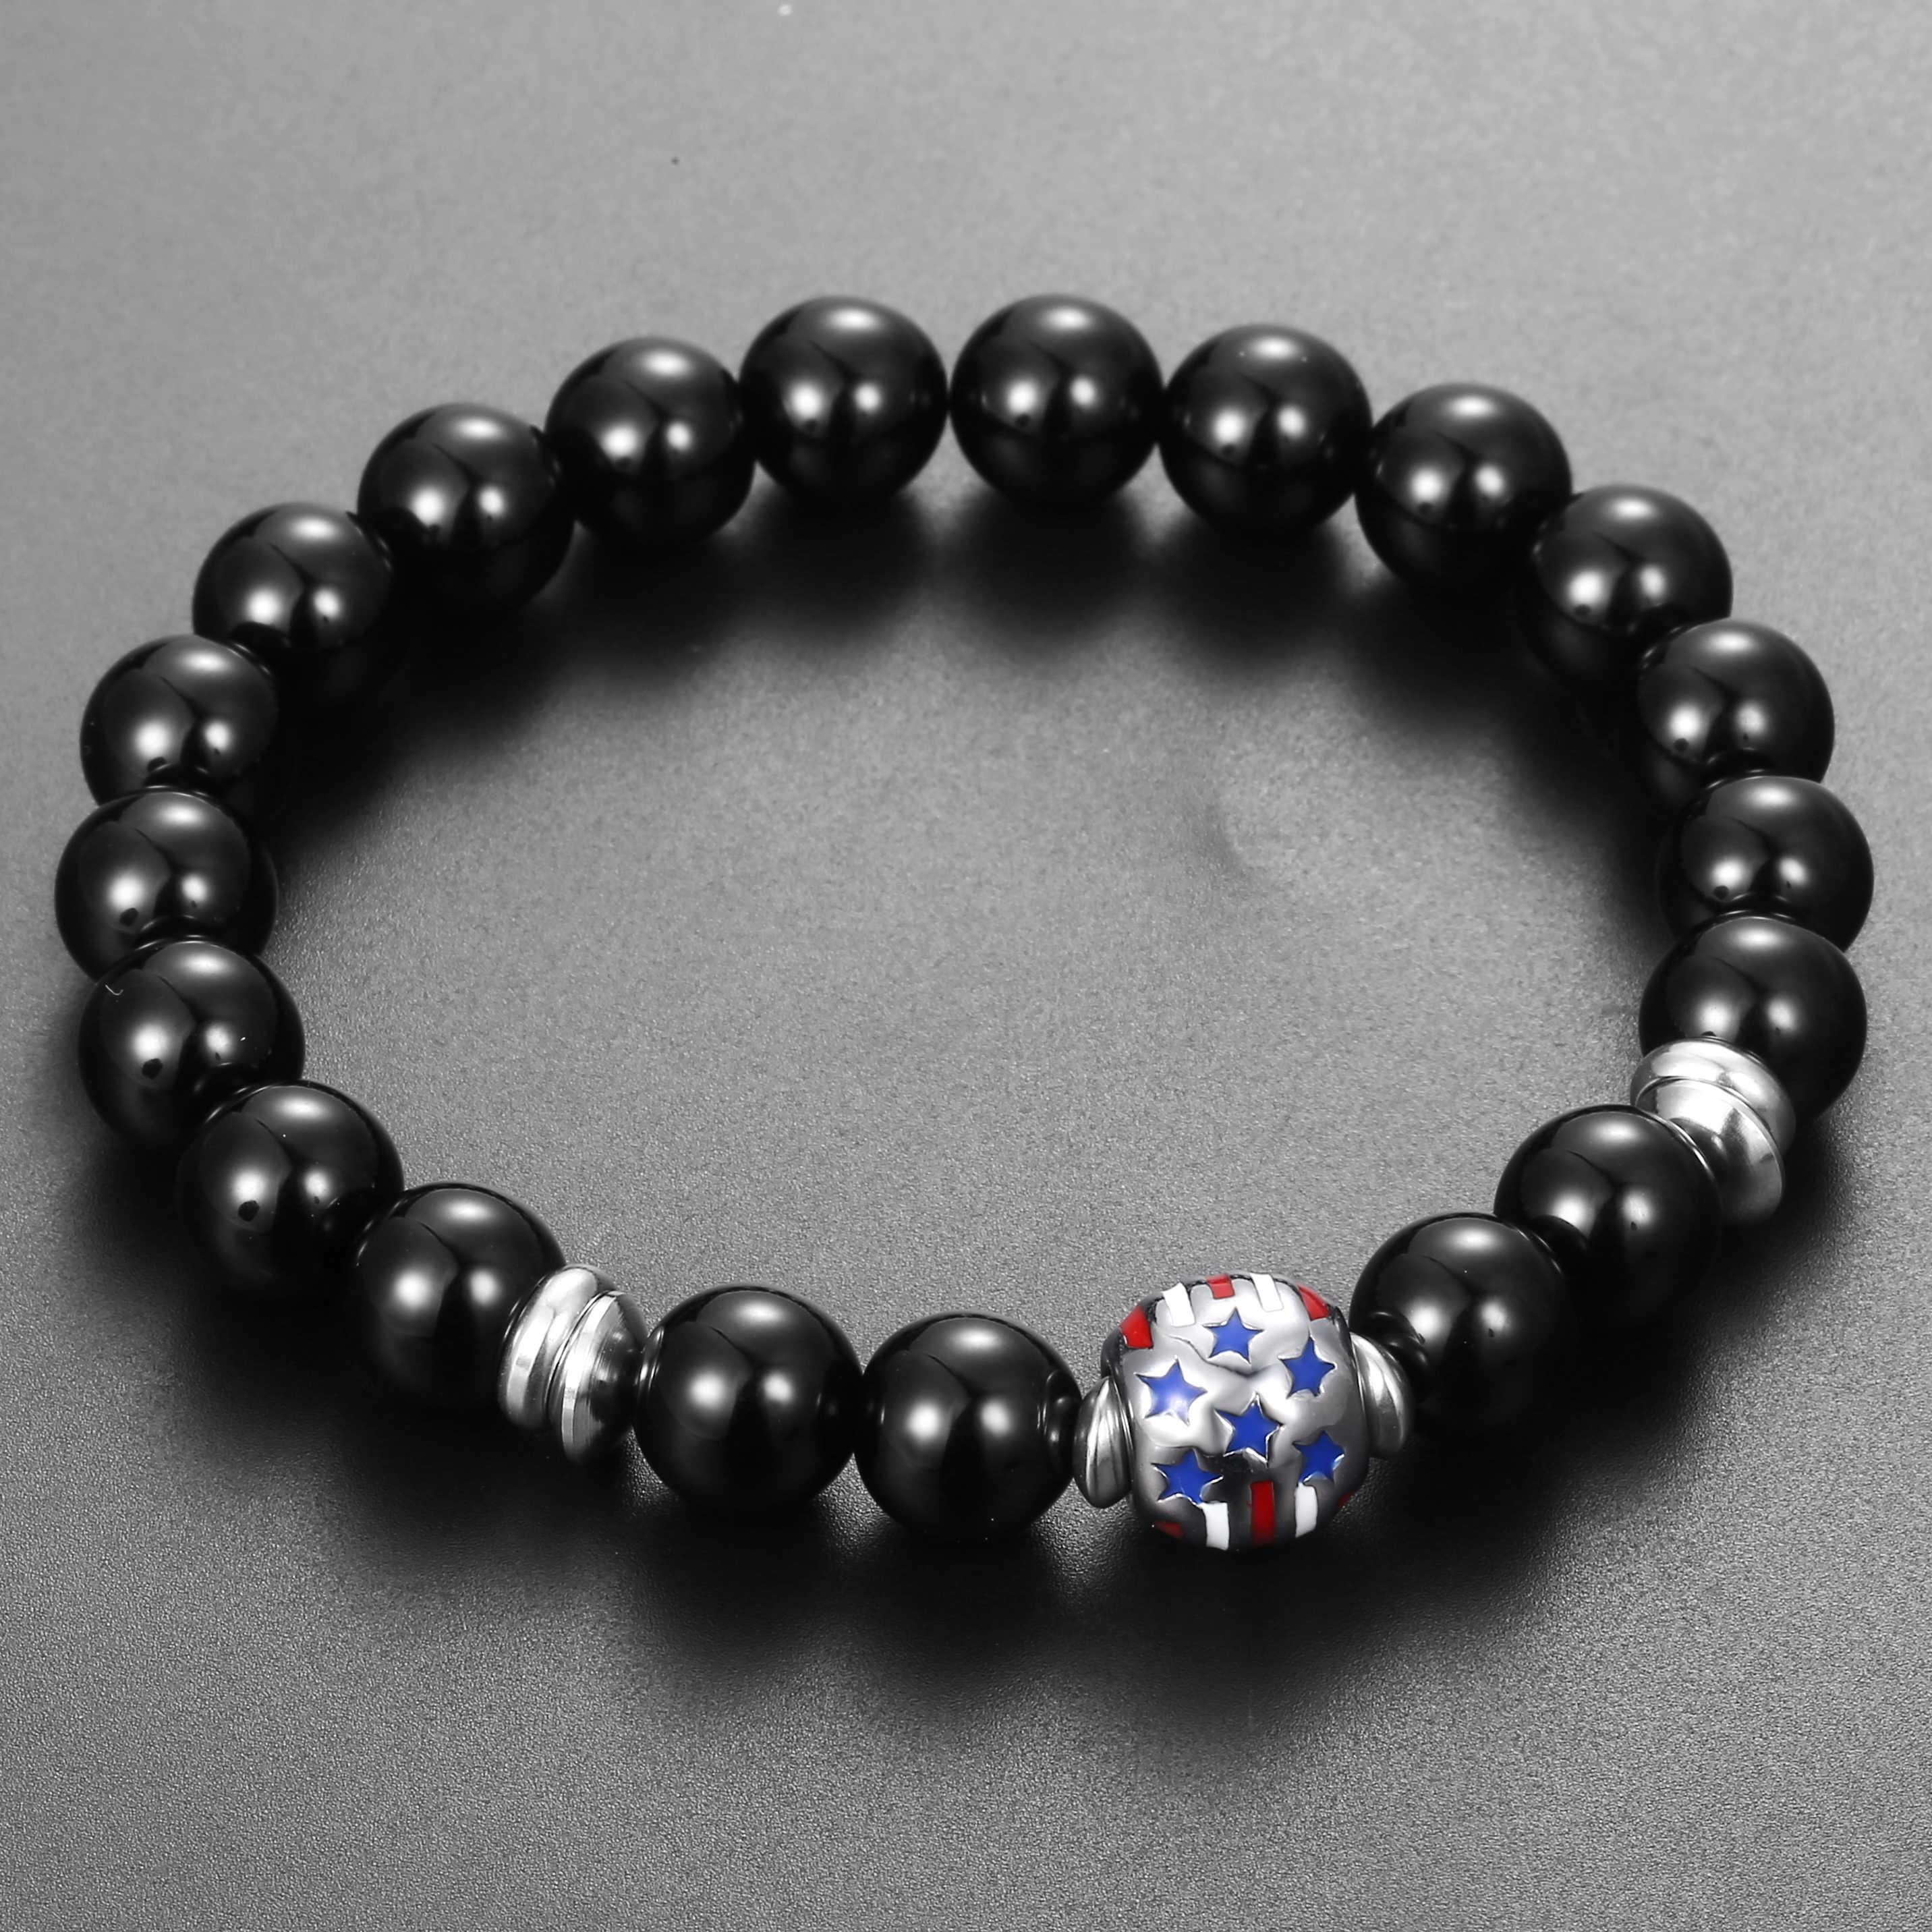 Black Glass Bead Bracelet Mens Womens Stainless Steel Love USA American Flag Heart Couple Charm Bracelet Stretch 8mm 10mm DBM56